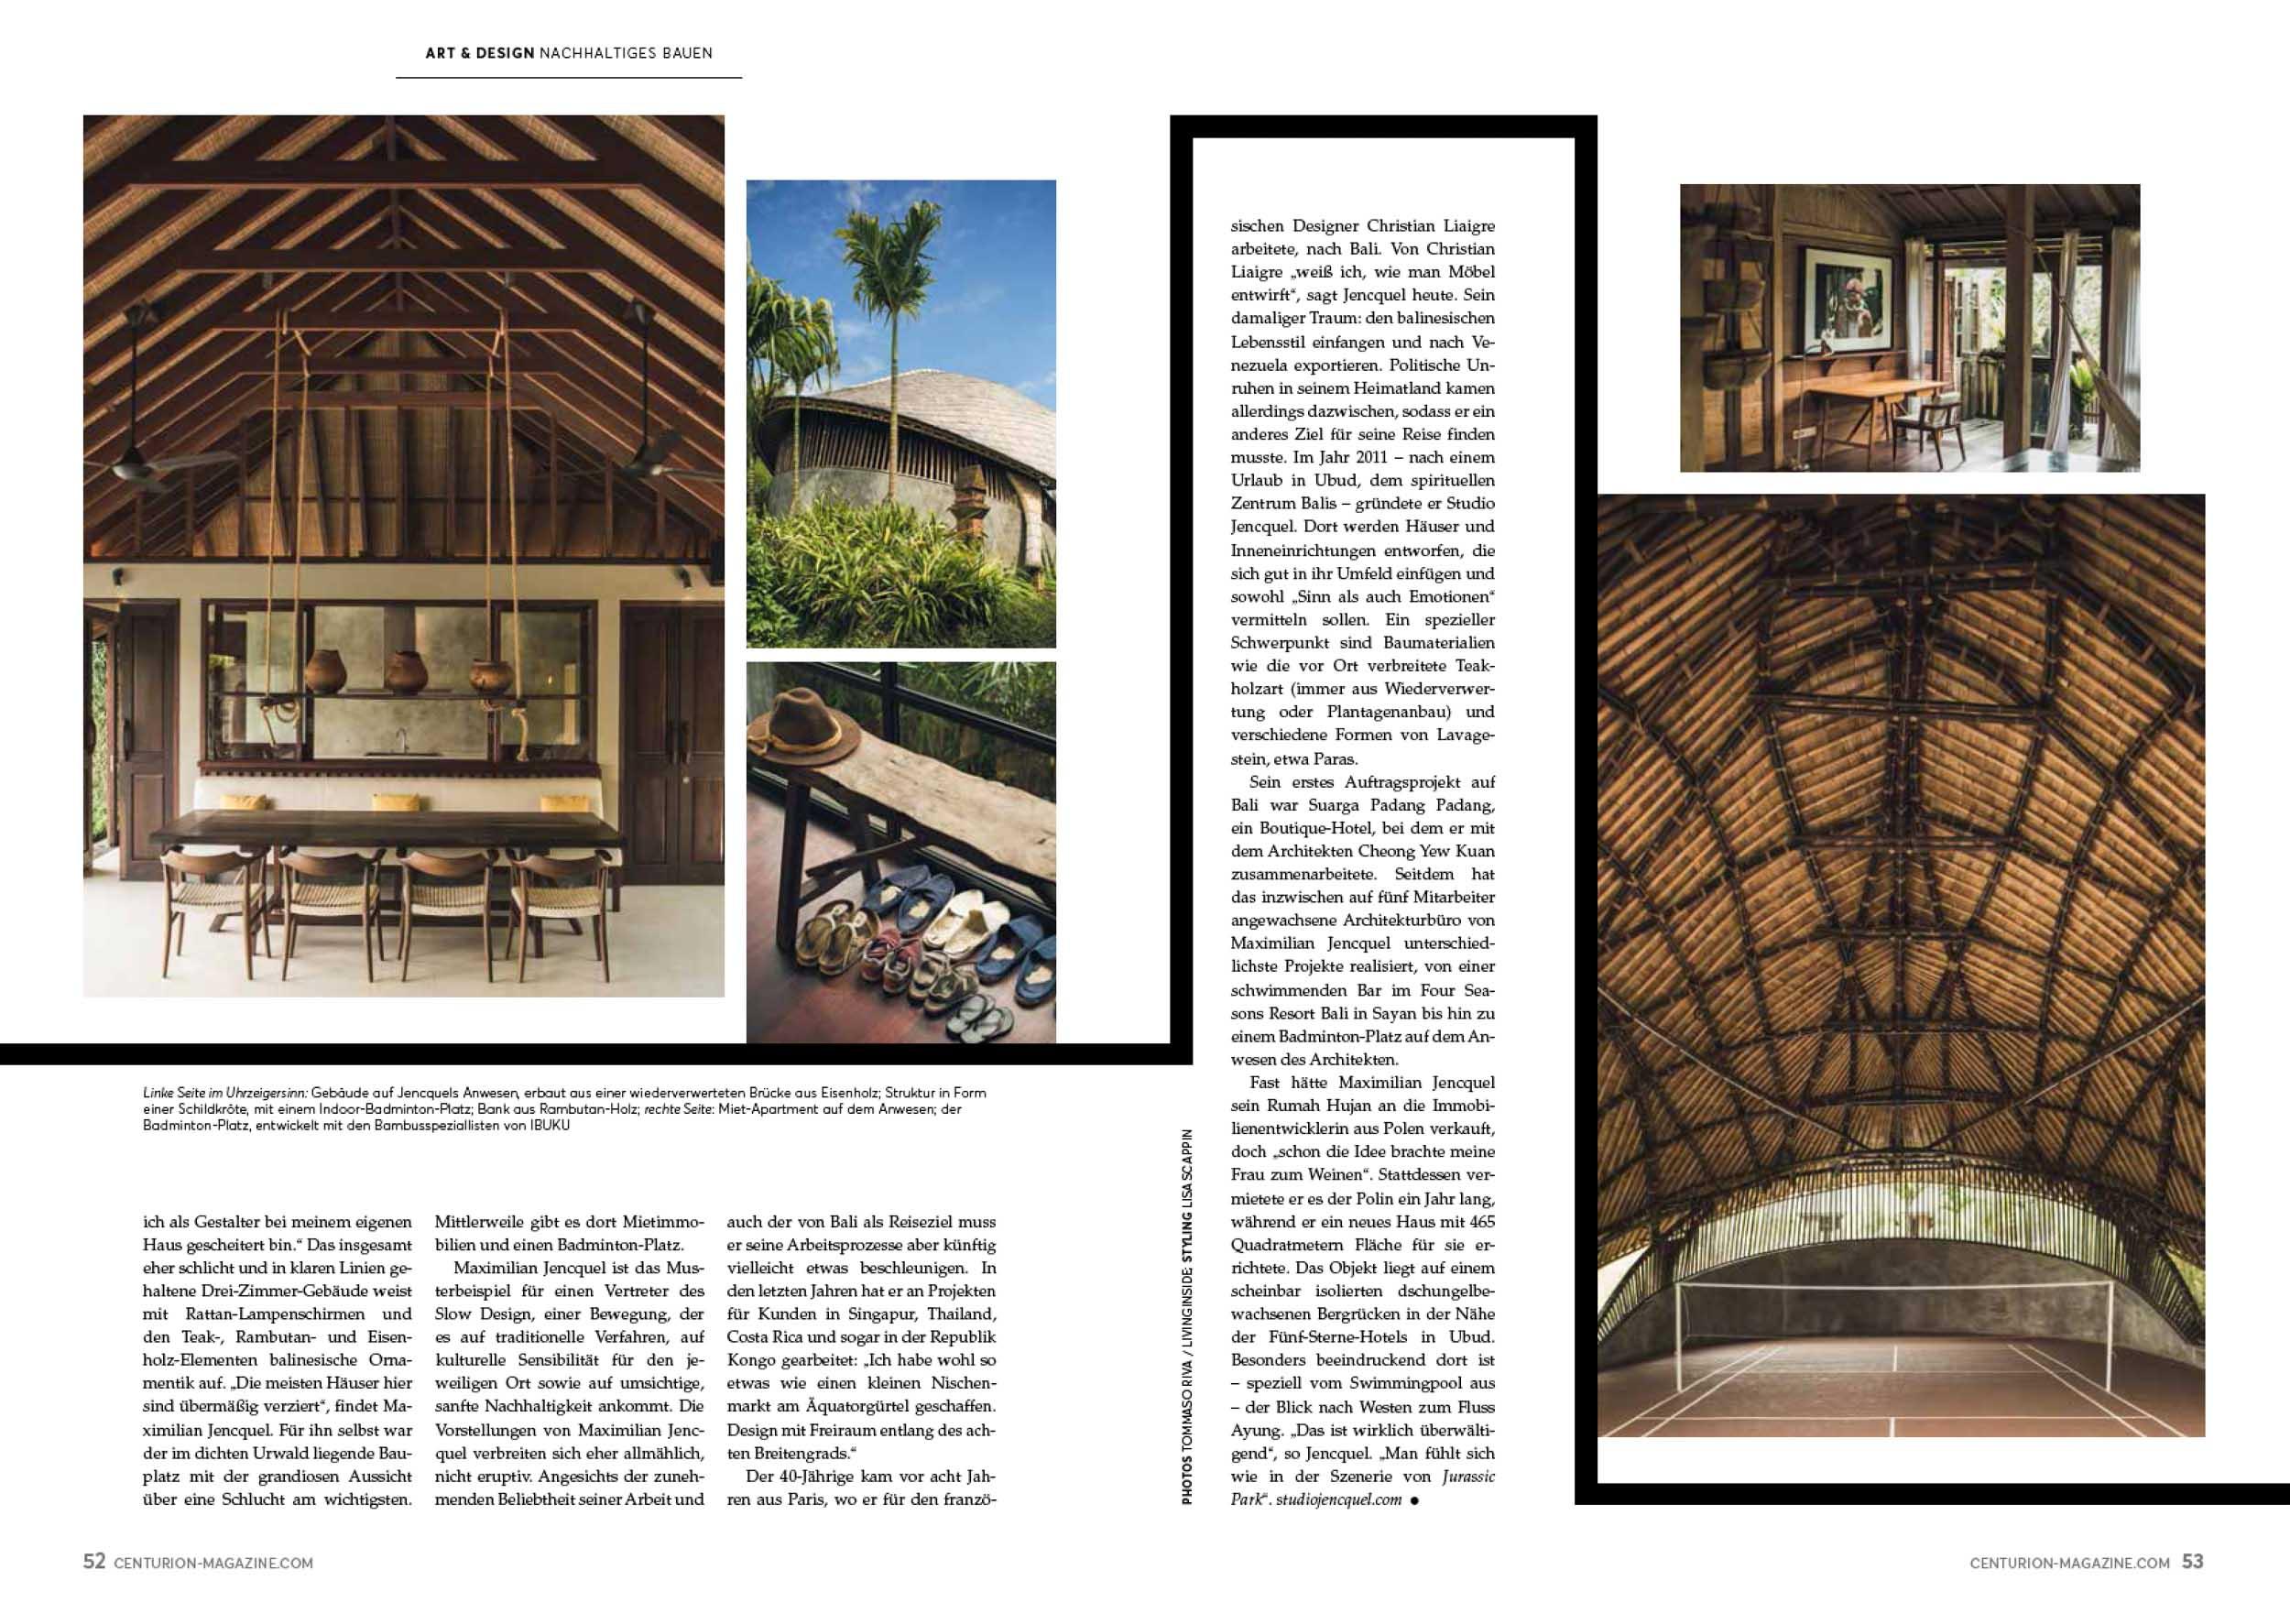 centurion-magazine-max-jencquel-bali-tommaso-riva-lisa-scappin-interiors (2 of 2).jpg